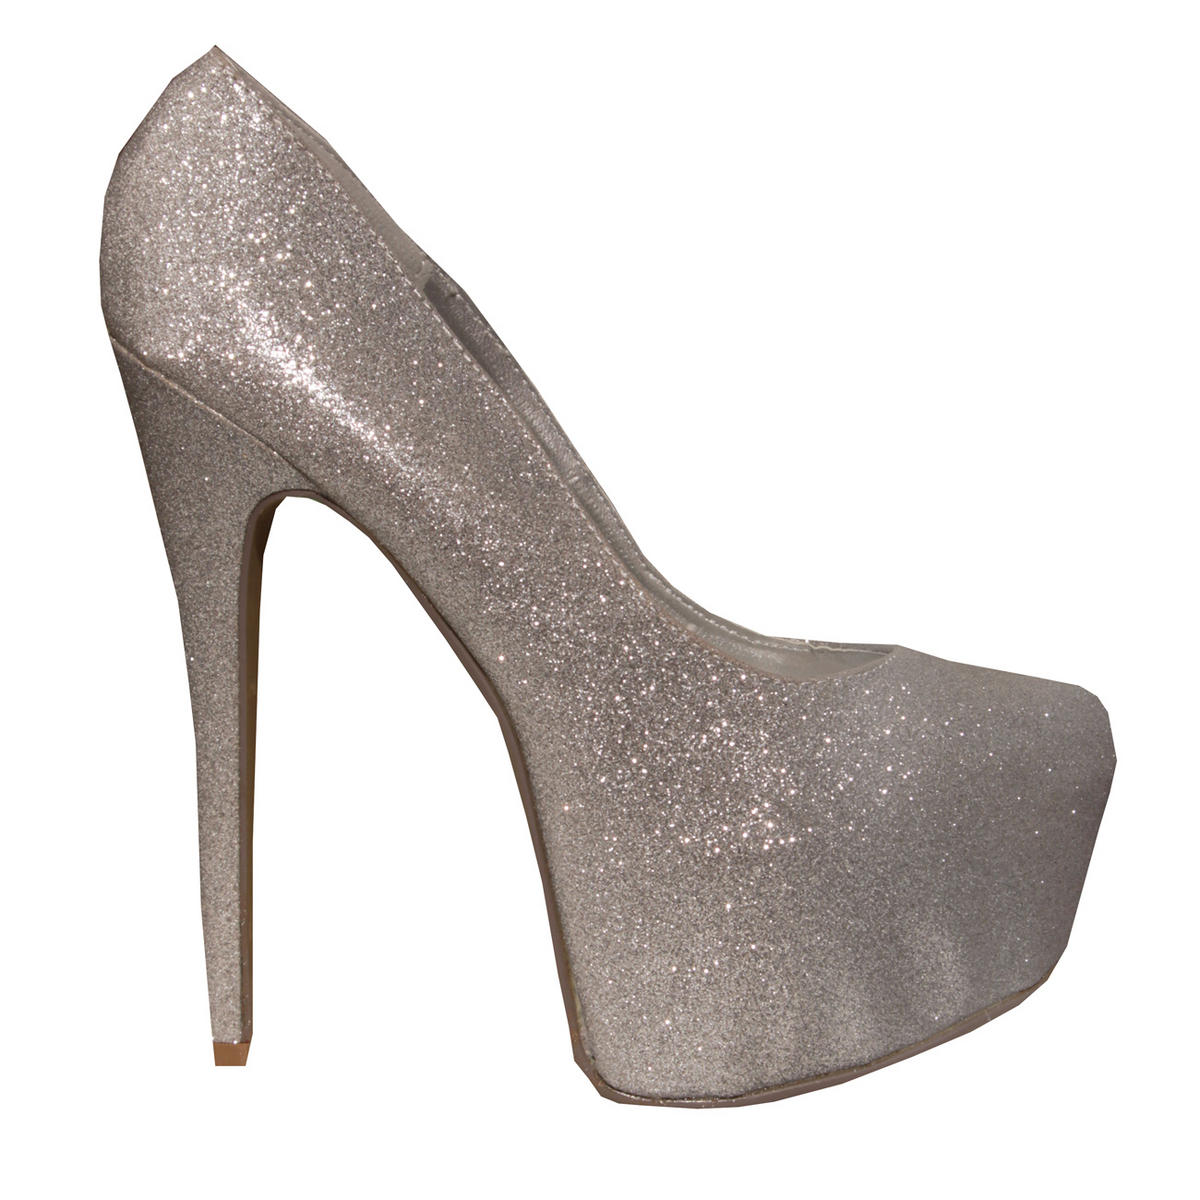 Item Details - Silver Glitter Platform Heel